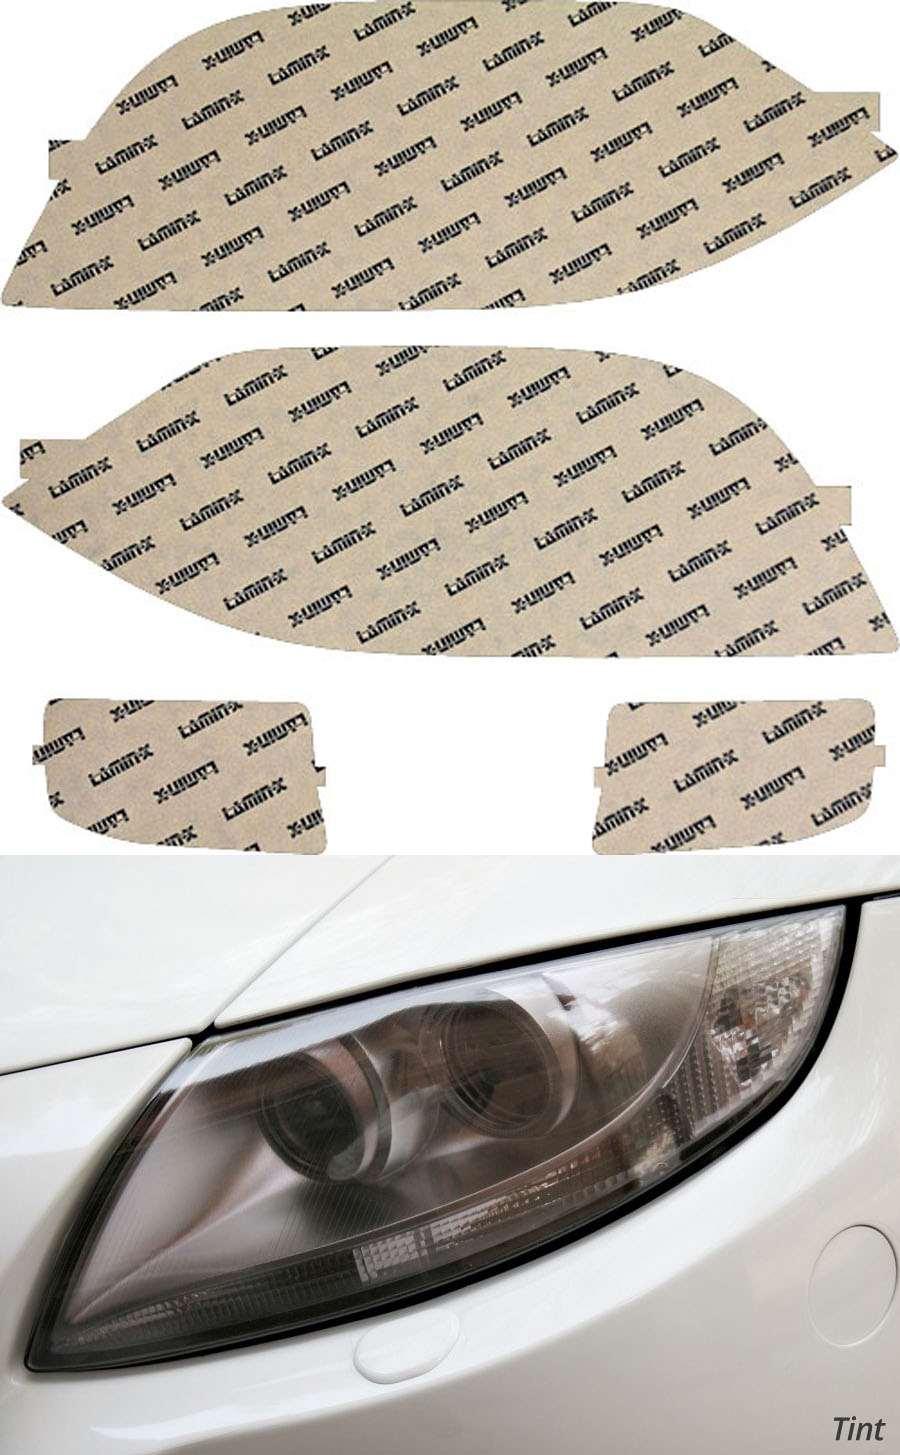 Acura MDX 04-06 Tint Headlight Covers Lamin-X AC507T